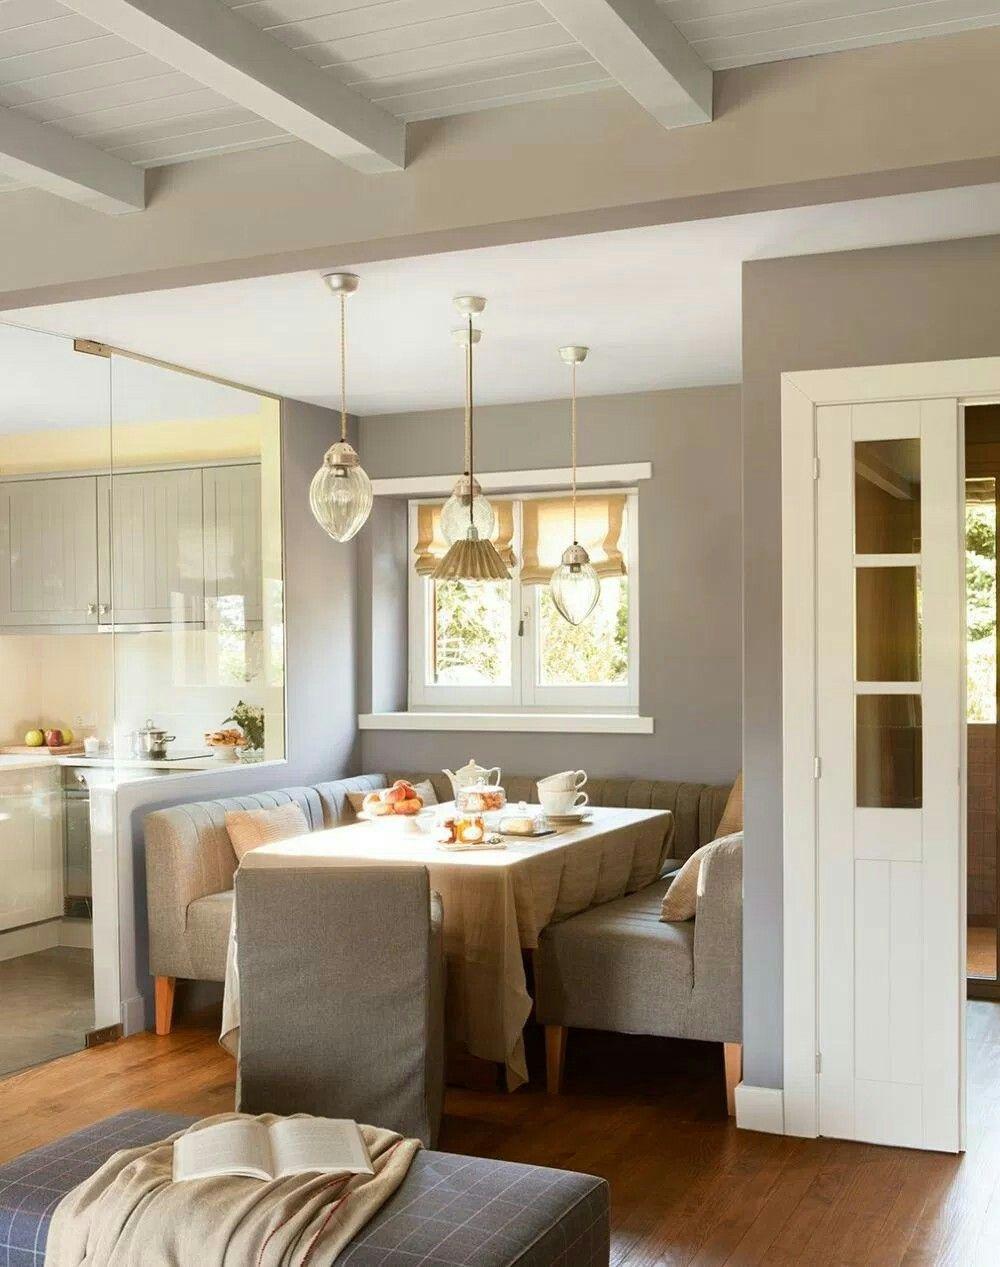 Pin De Manu Gmz En Home Deco Pinterest Comedores Cocinas Y Ba O ~ Techos Decorativos Para Interiores